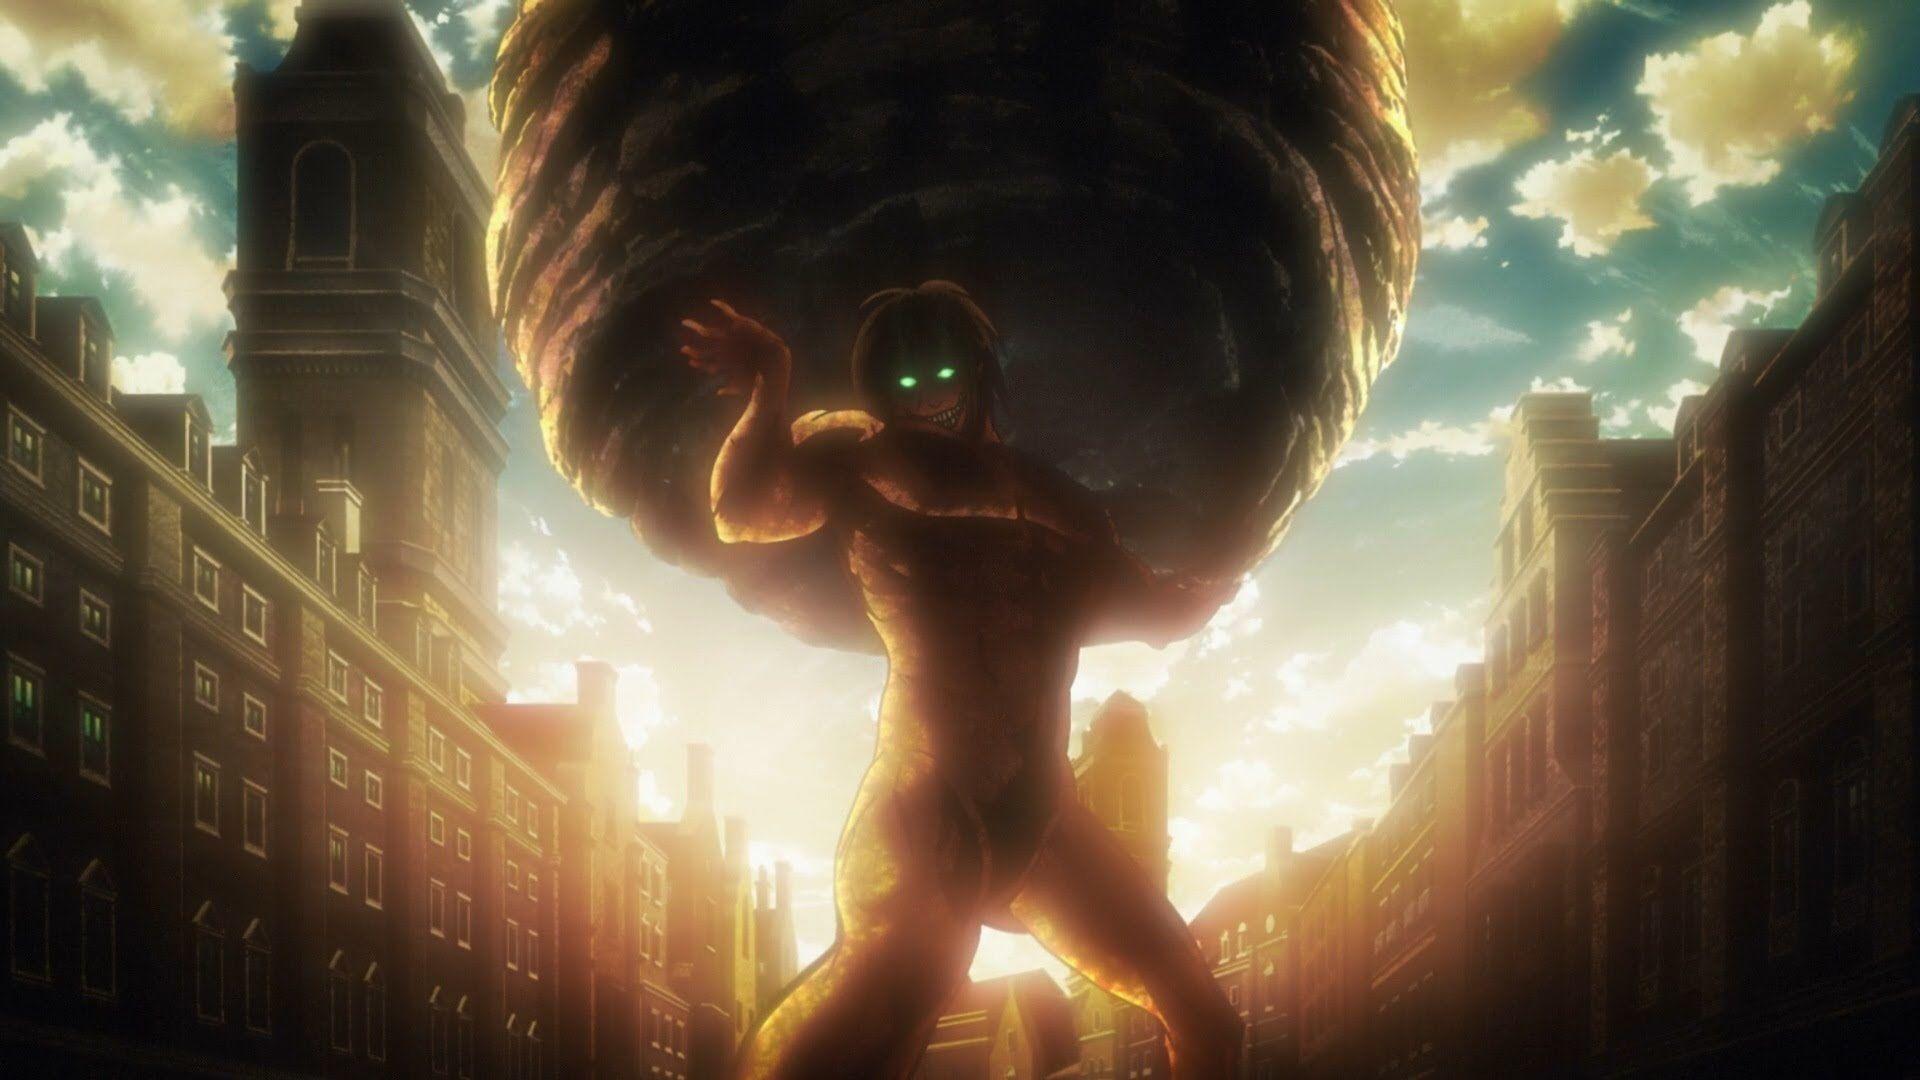 Anime Attack On Titan Eren Yeager 1080p Wallpaper Hdwallpaper Desktop Attack On Titan Aesthetic Attack On Titan English Attack On Titan Anime